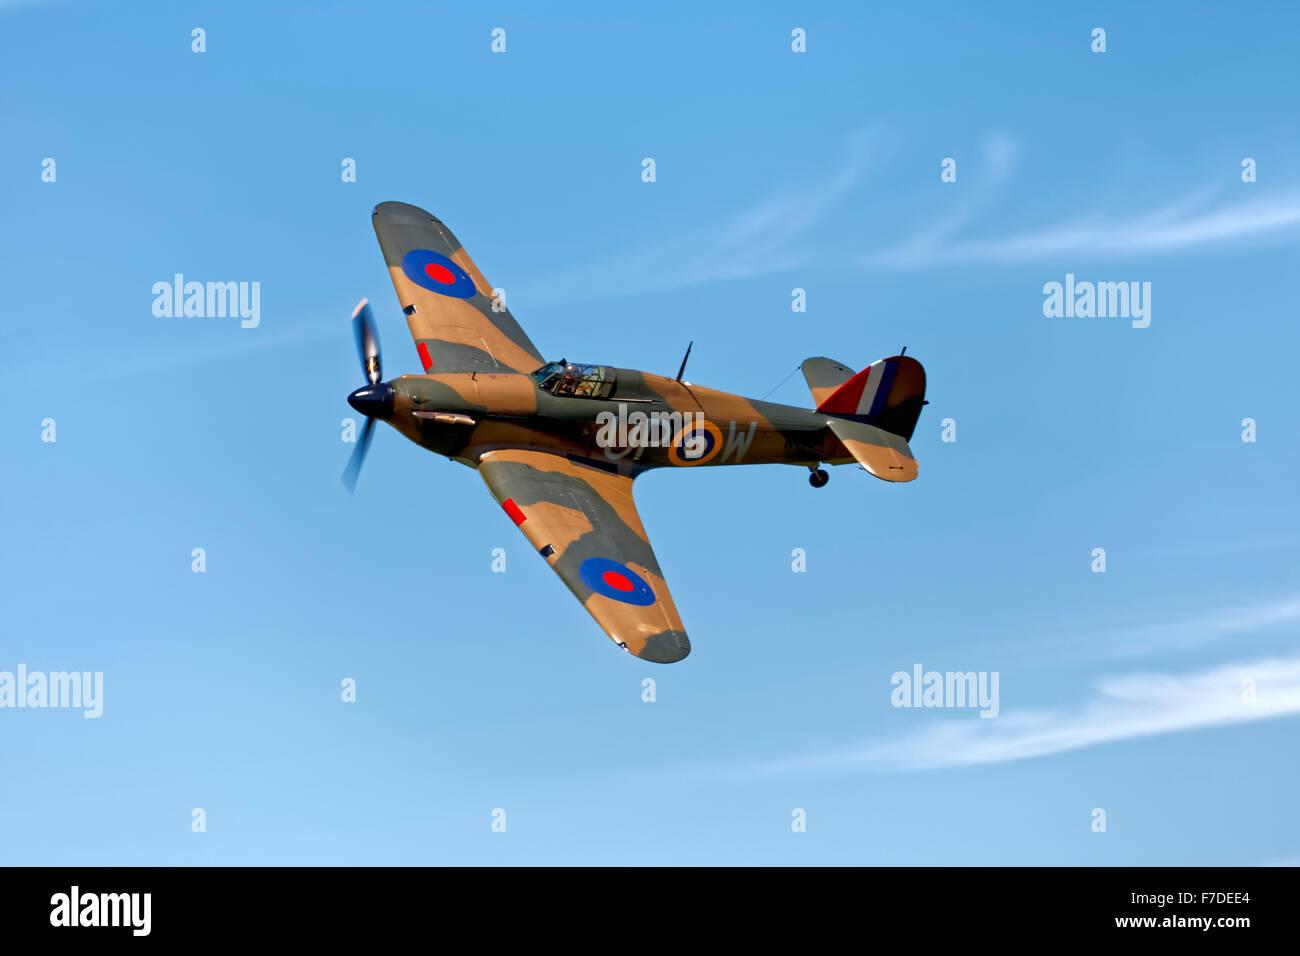 Hawker Hurricane Mk1 - R4118/ G-HUPW. - Stock Image